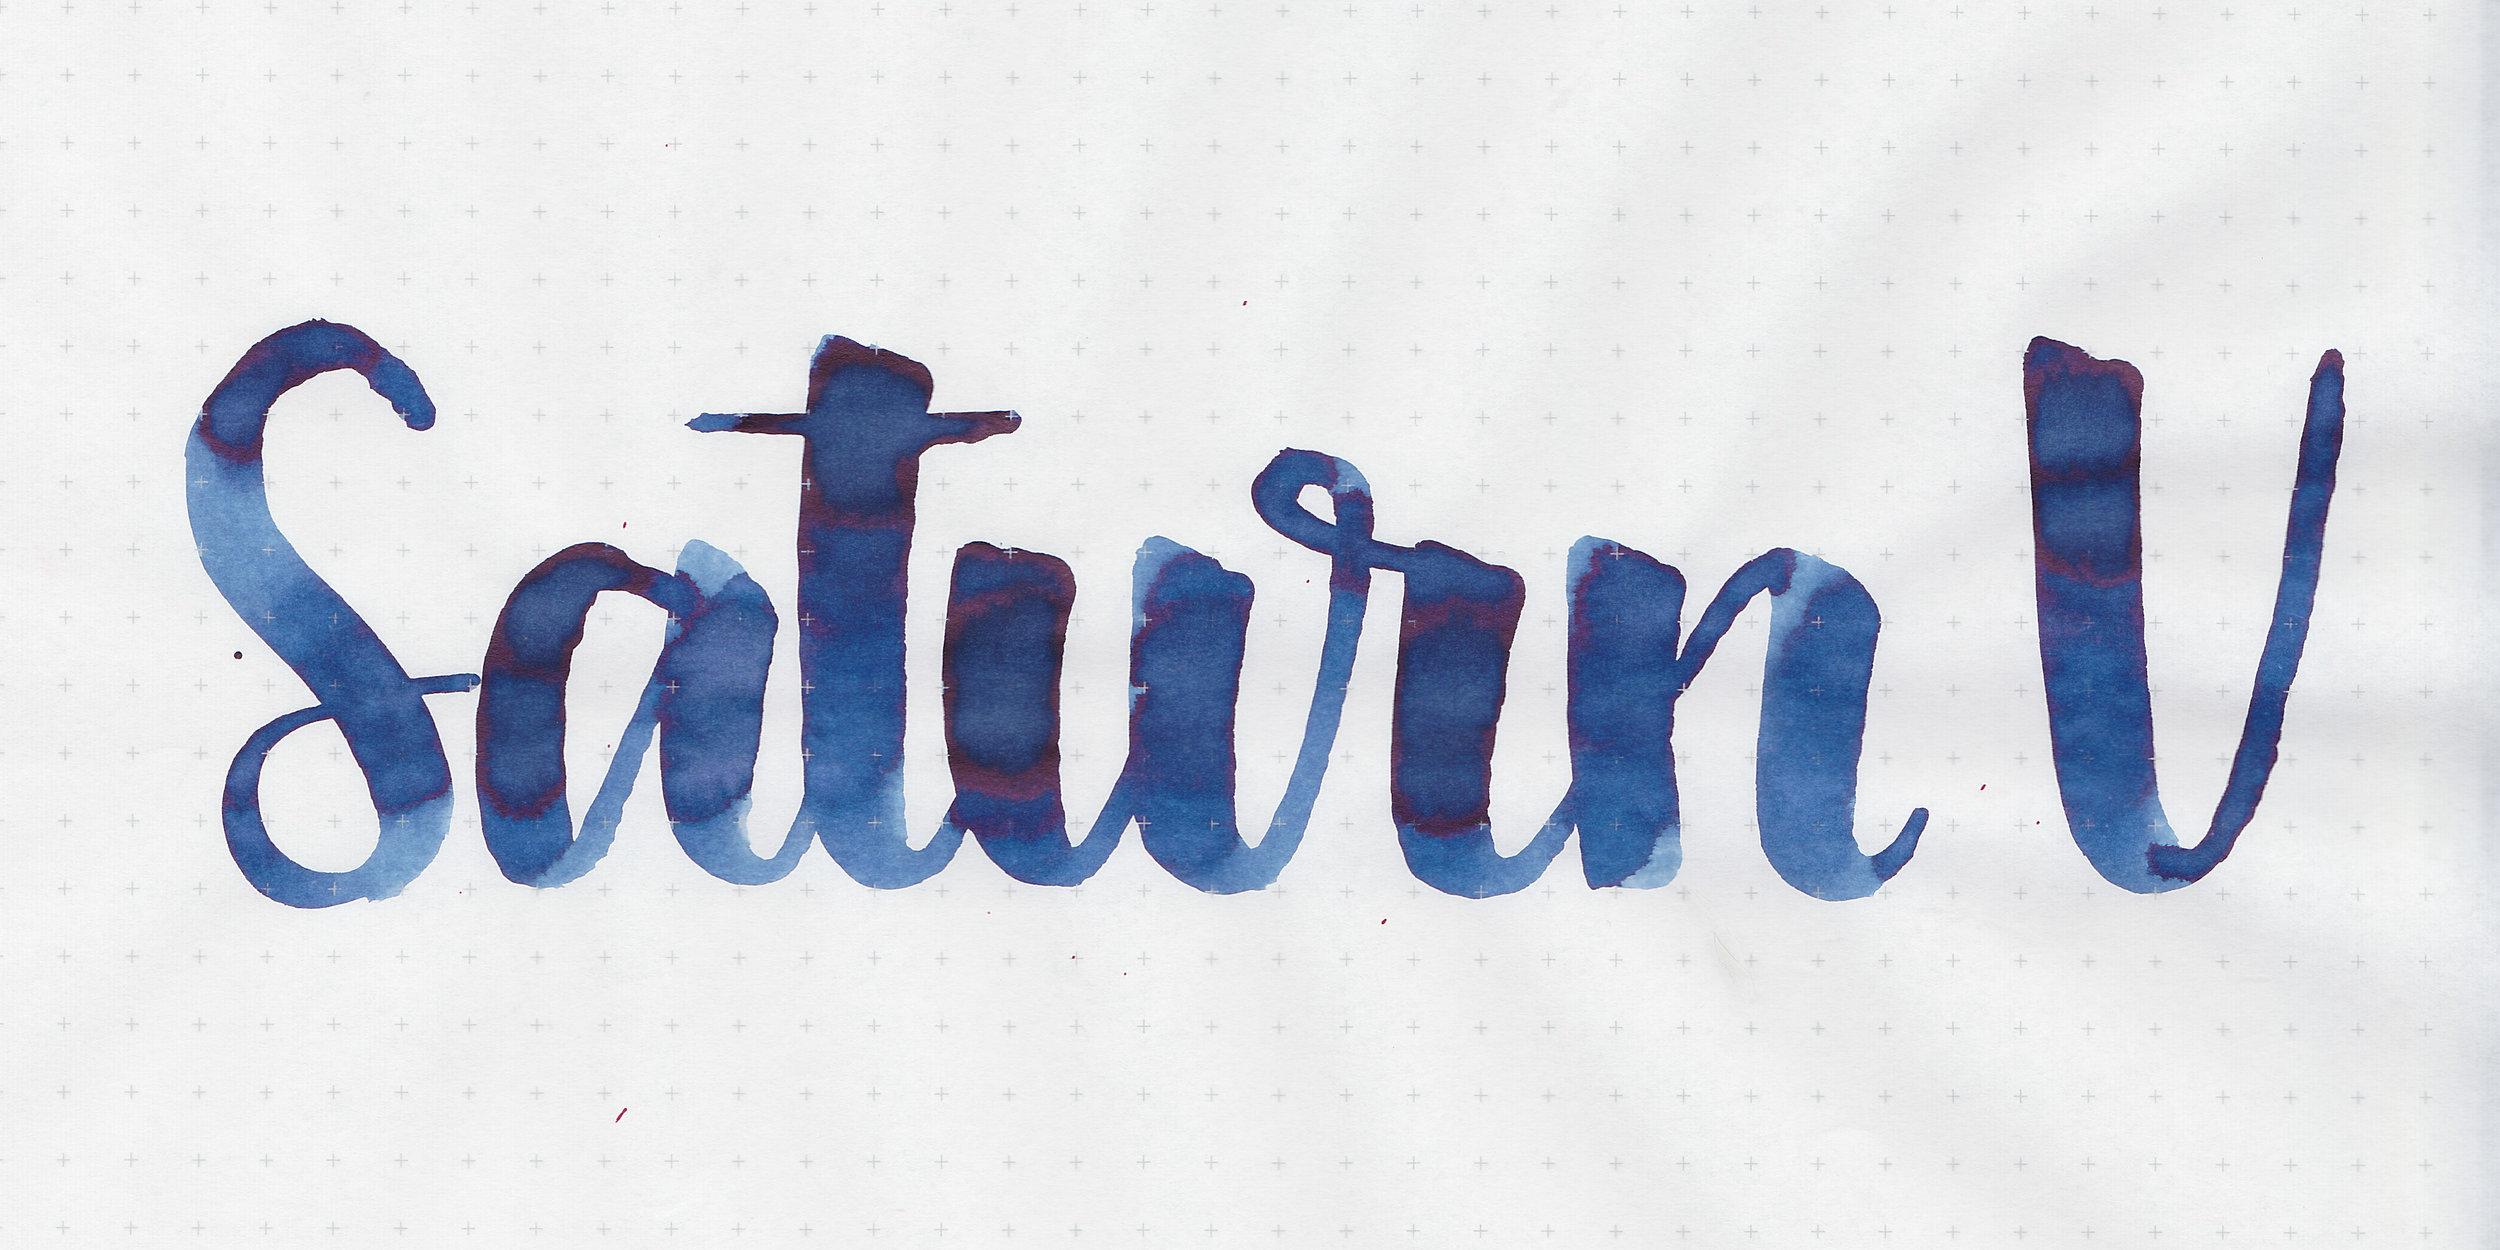 cv-saturn-v-14.jpg